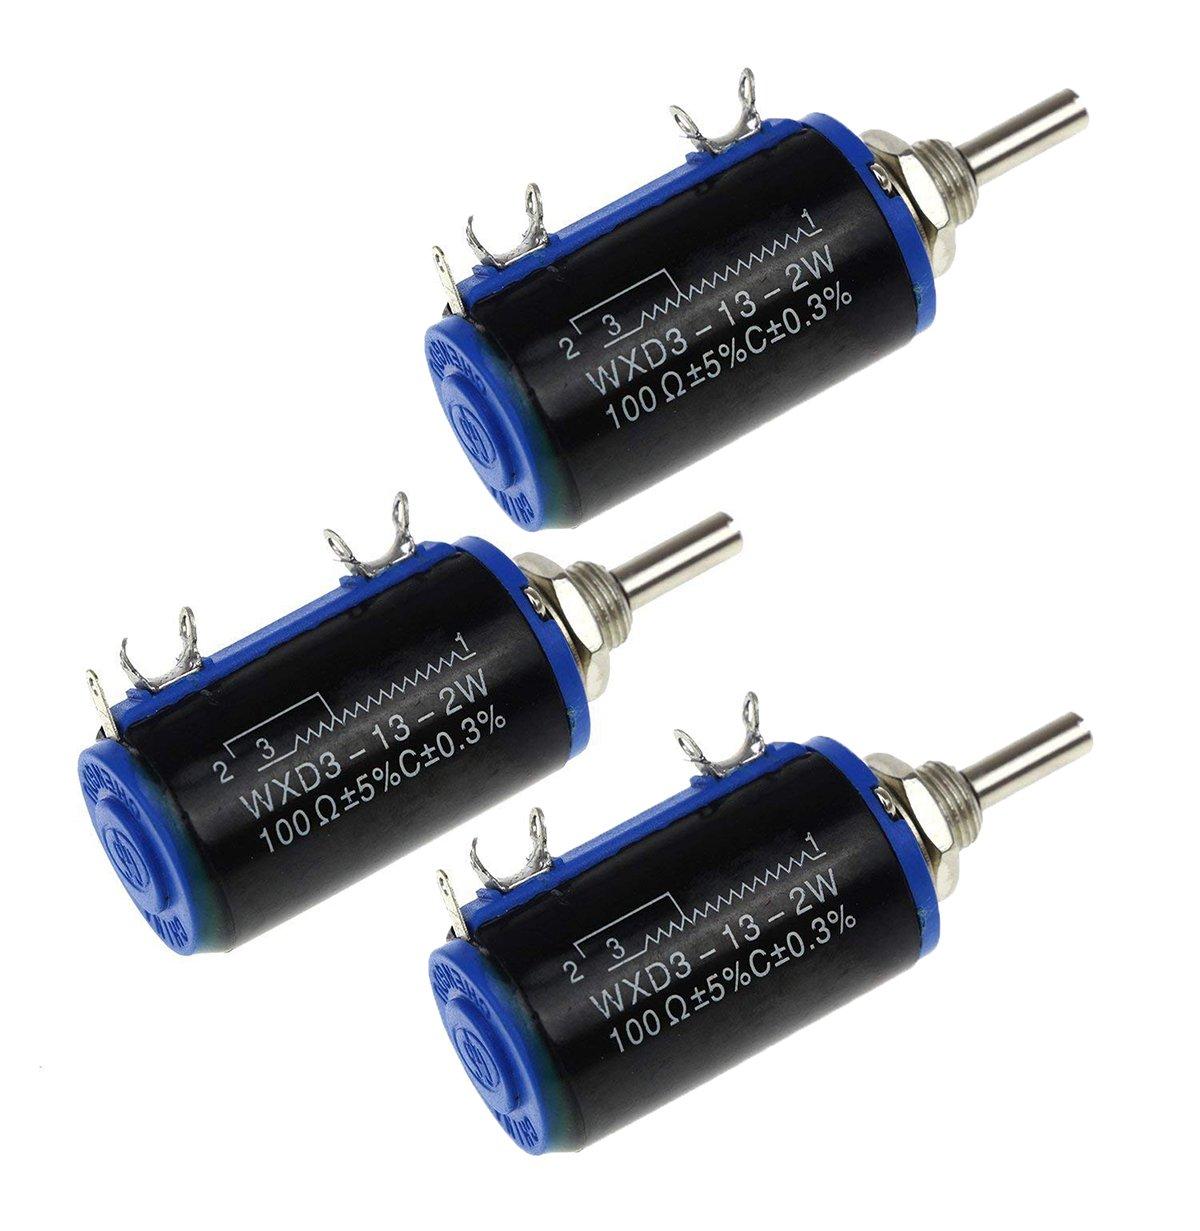 YXQ WXD3-13-2W 100 ohm Potentiometers MultiTurn Wirewound Control 5Pin, 4mm Drive Shaft Dia,5% Tolerance(3Pcs)